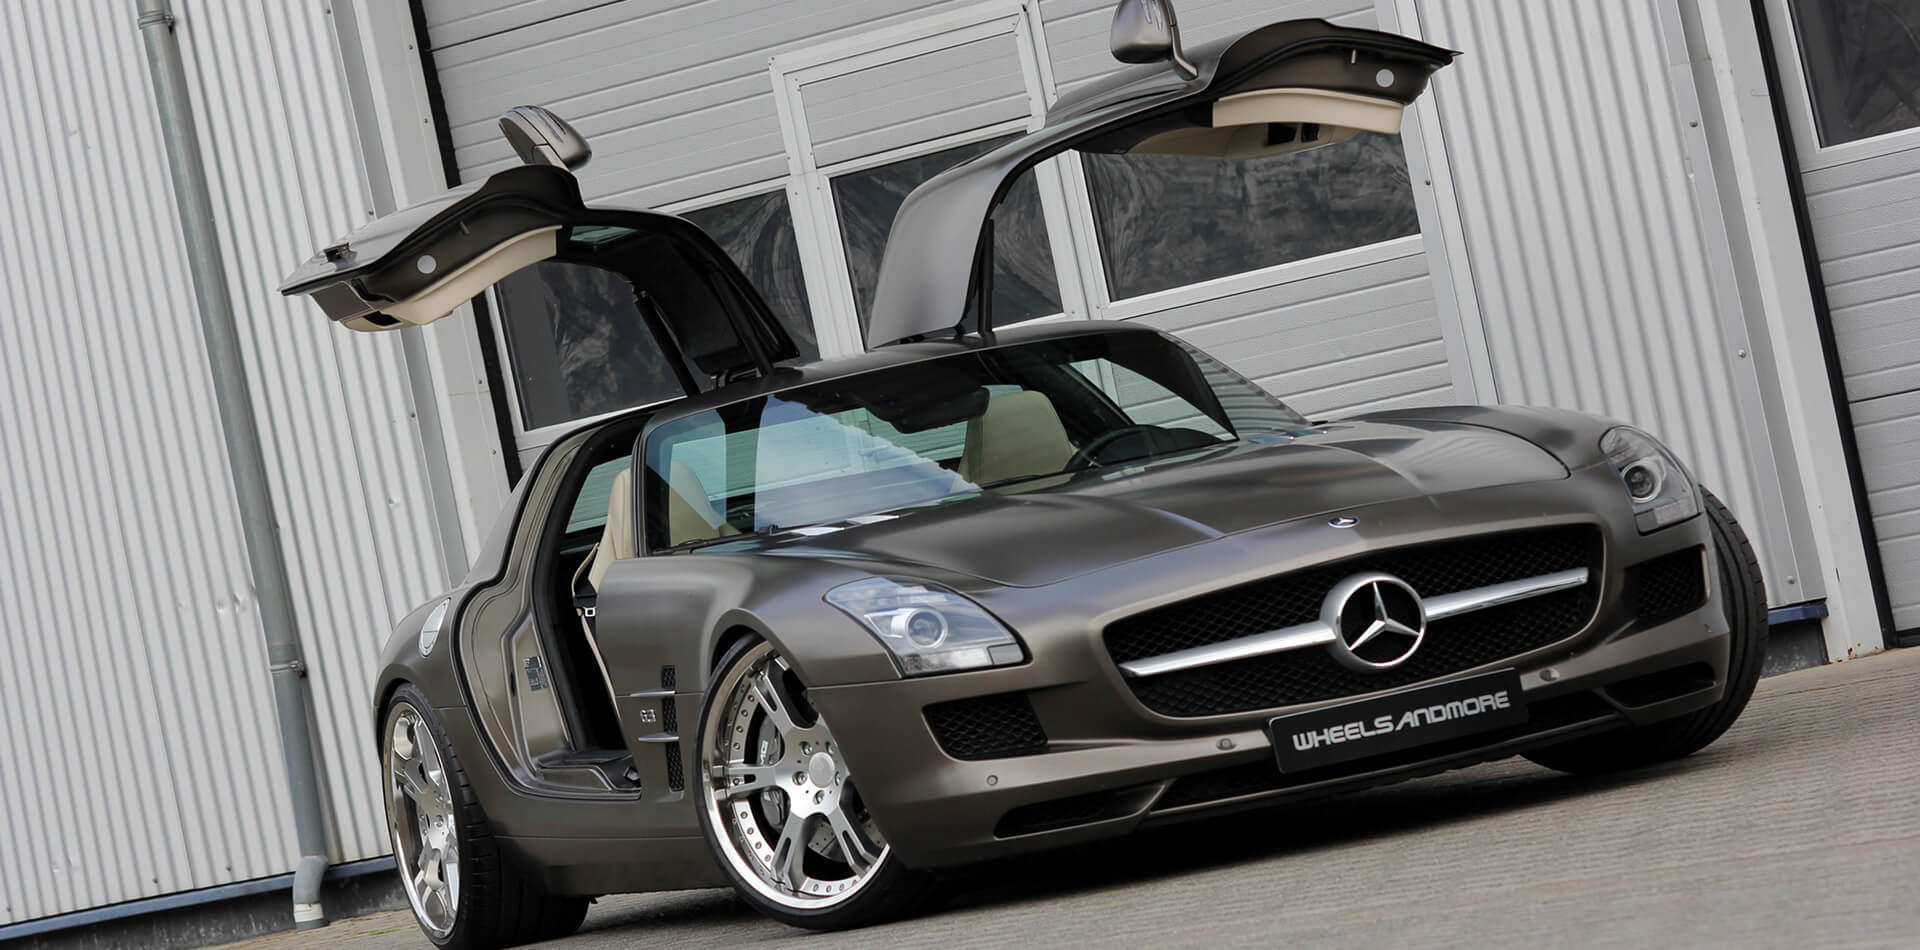 Mercedes_Benz_SLS_AMG_21_Zoll_Alufelgen-1